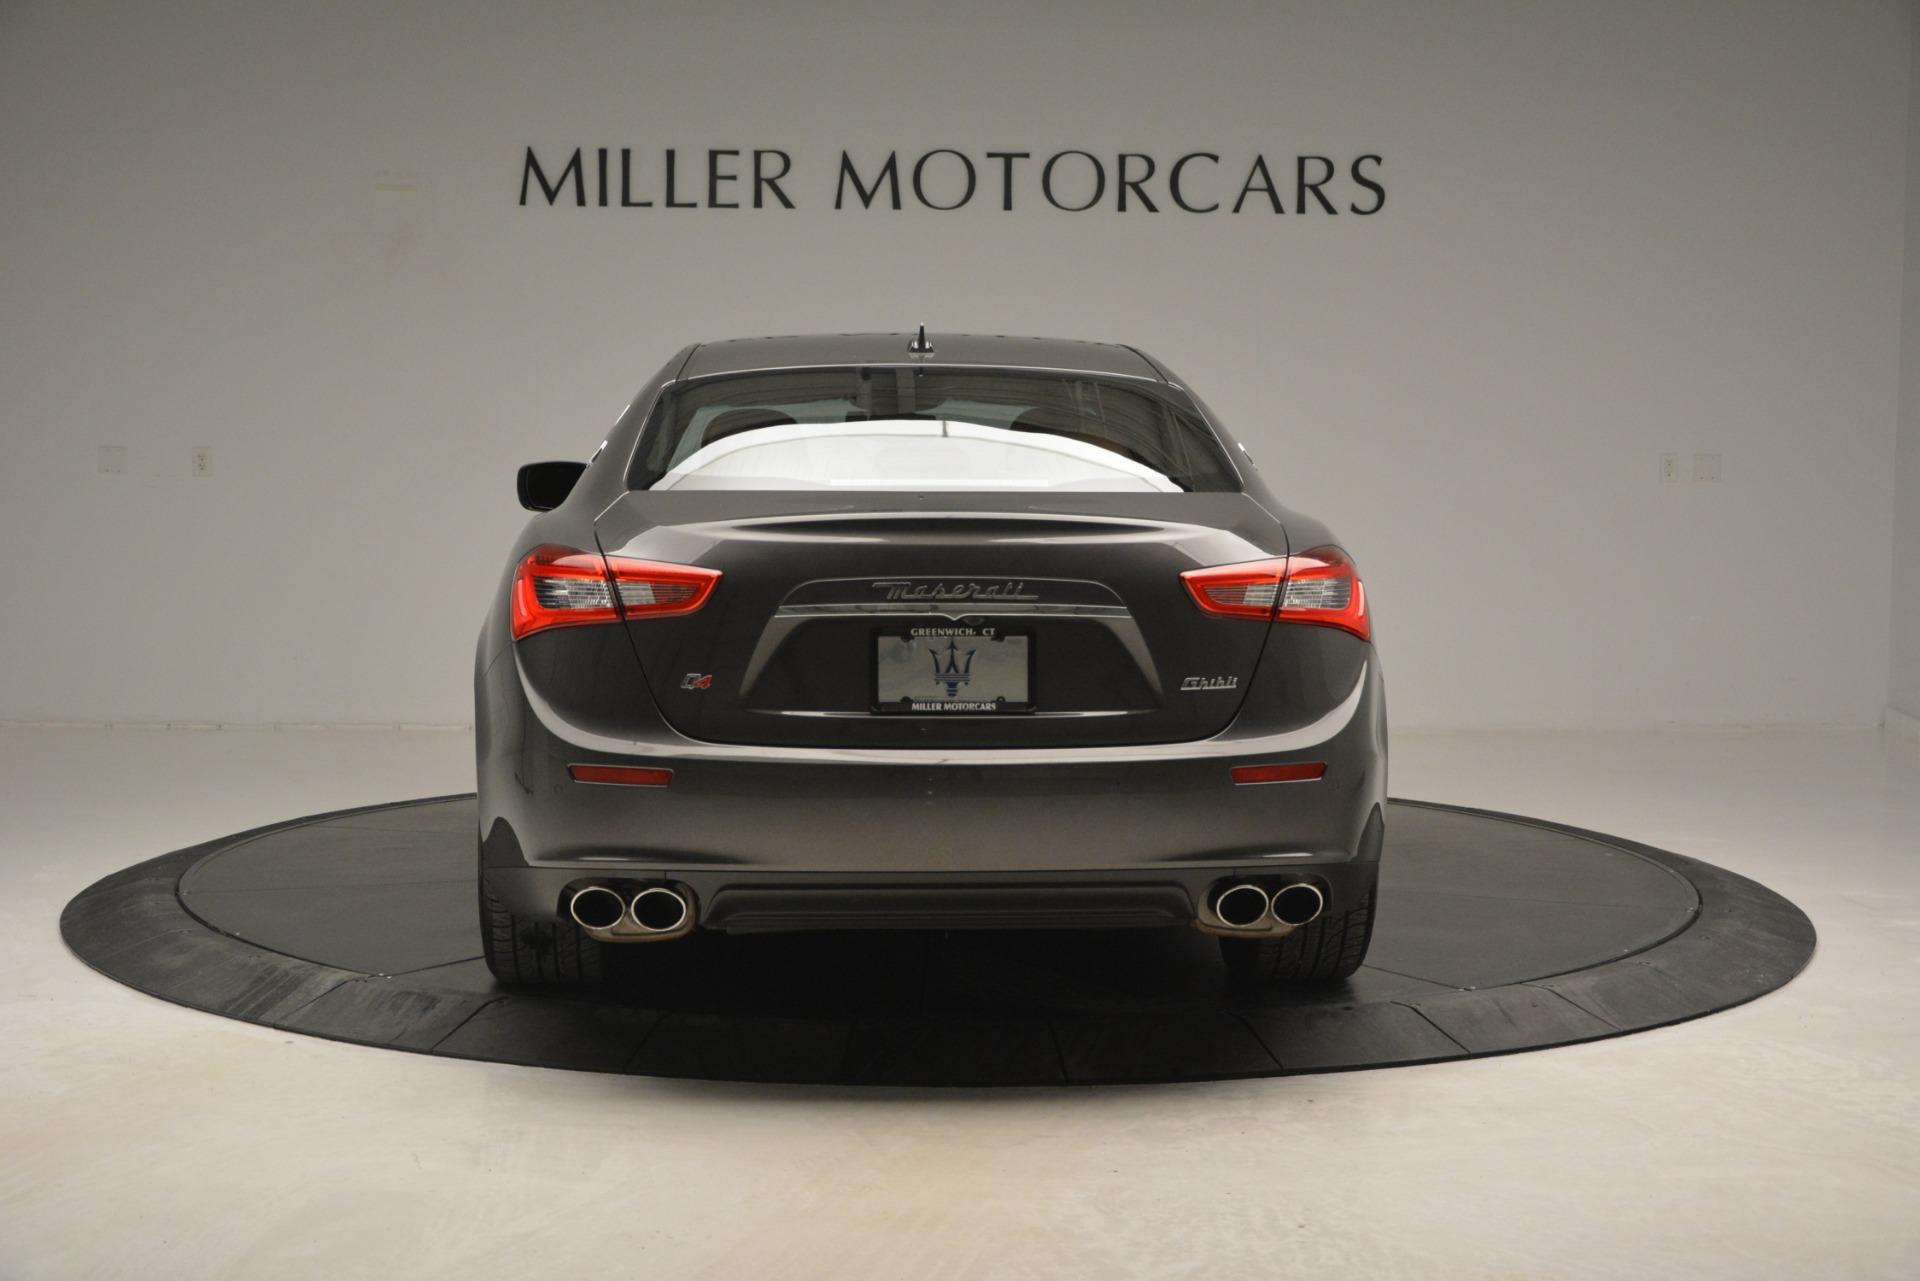 Used 2015 Maserati Ghibli S Q4 For Sale In Greenwich, CT 2941_p7